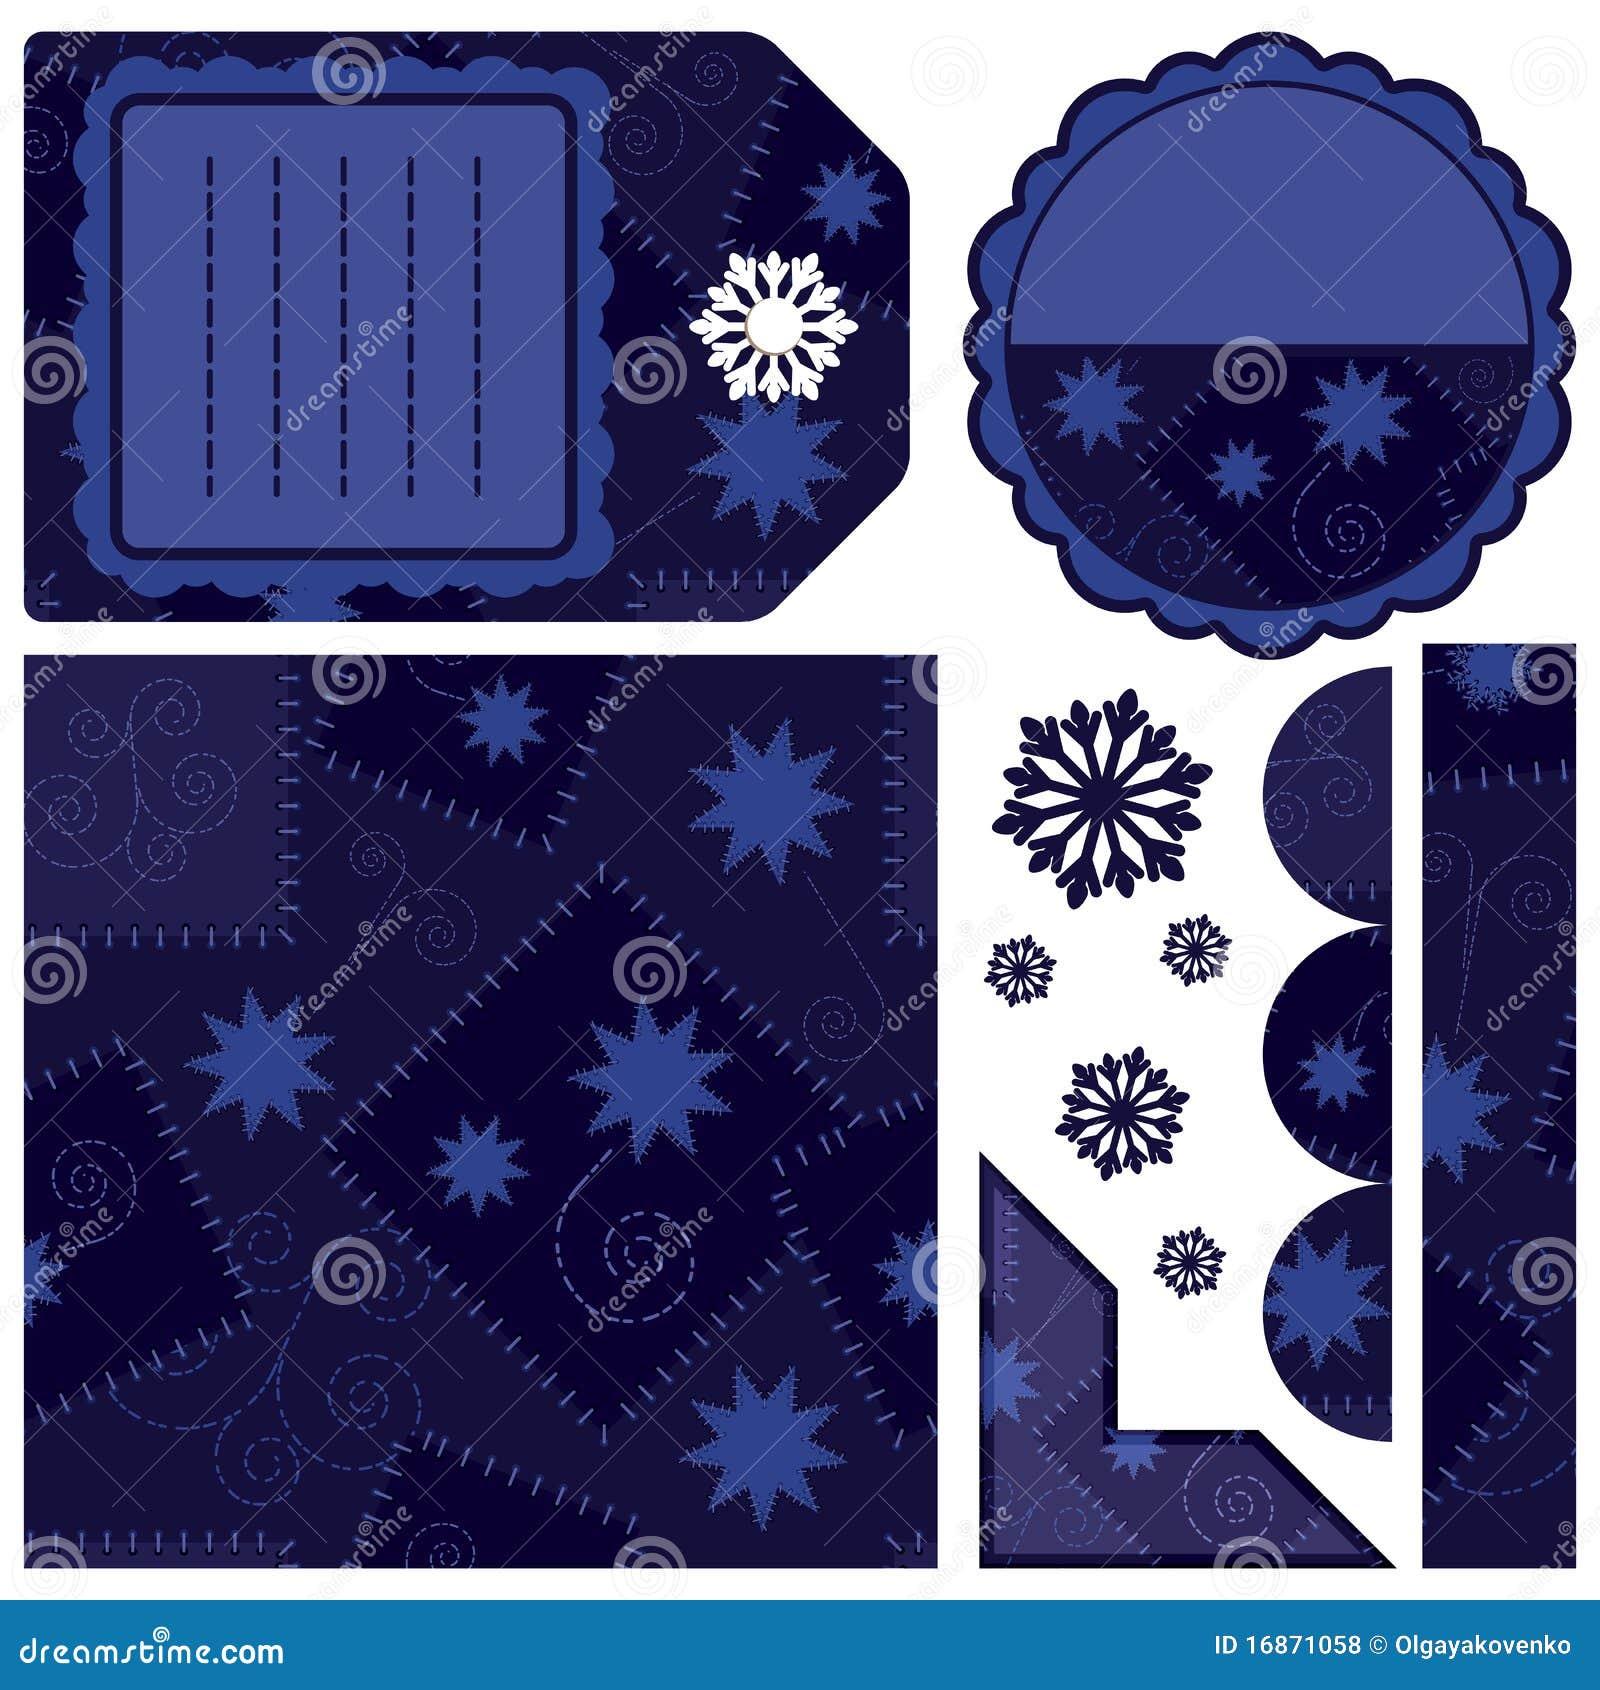 Jogo de elementos do projeto - obscuridade - azul